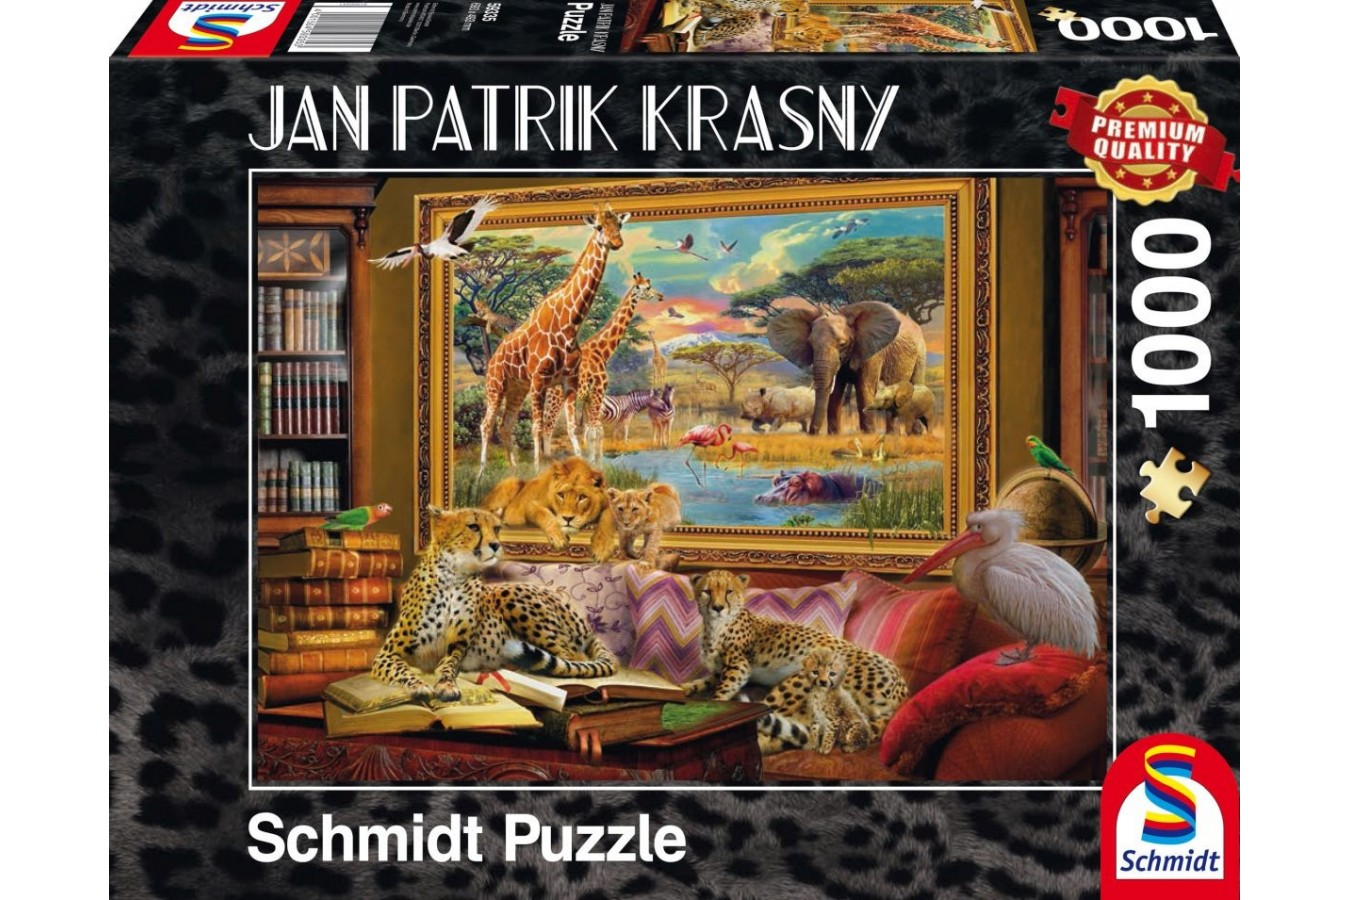 Puzzle Schmidt - Jan Patrik Krasny: Animalele din savana prind viata, 1.000 piese (59335)